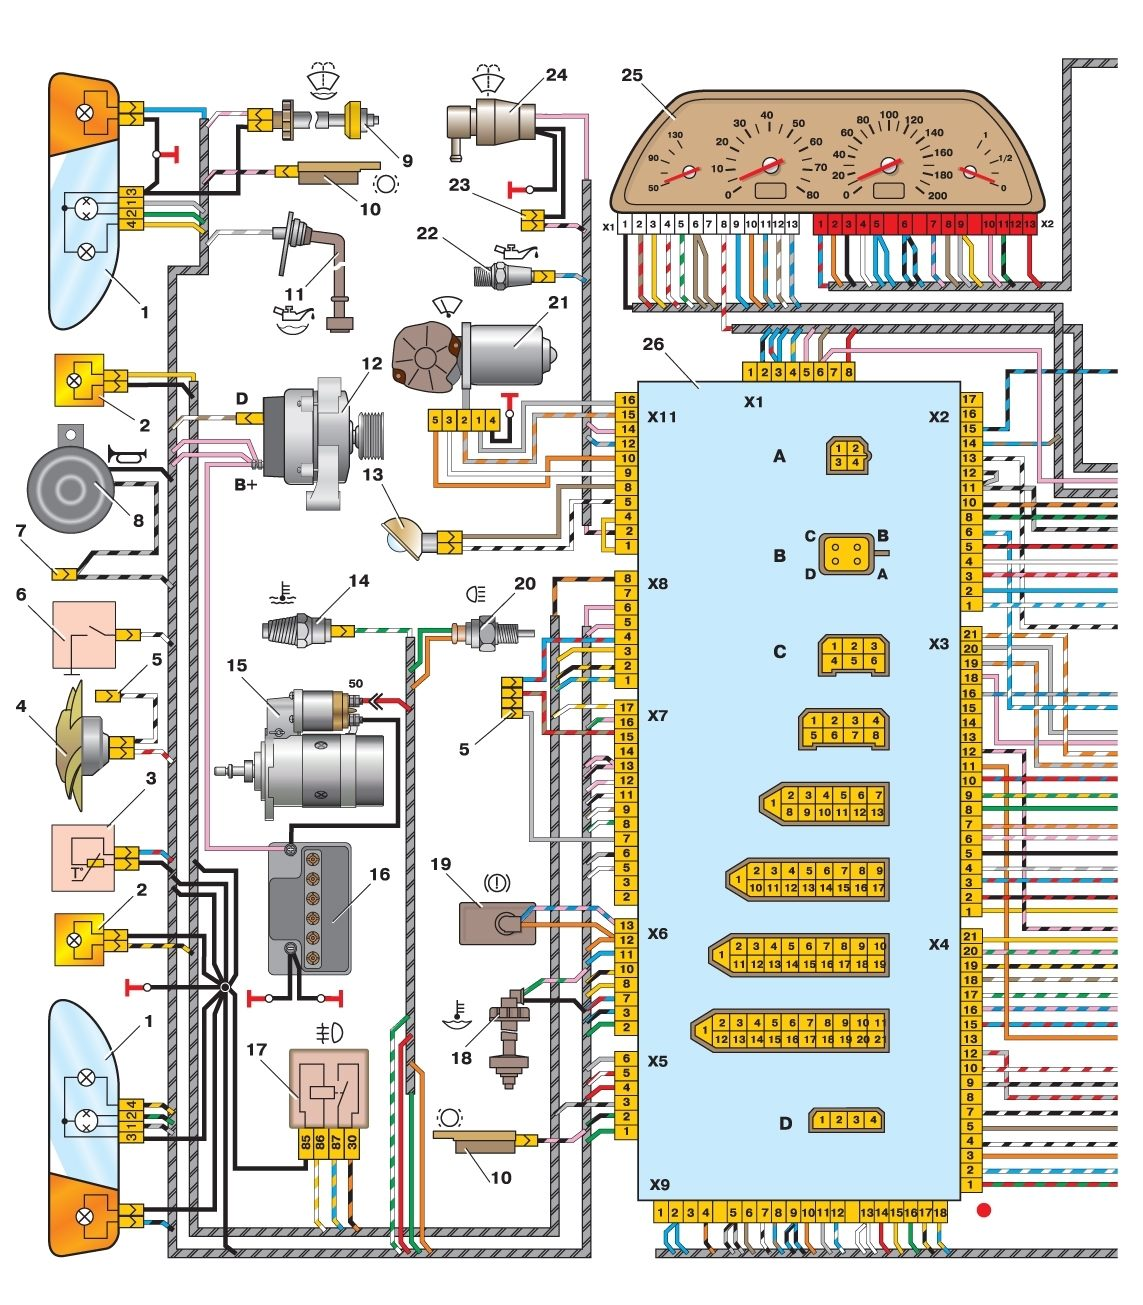 Автор: Gardabei.  Схема электрооборудования.  Добавлено: Thu Jul 12 2012 20:48:15.